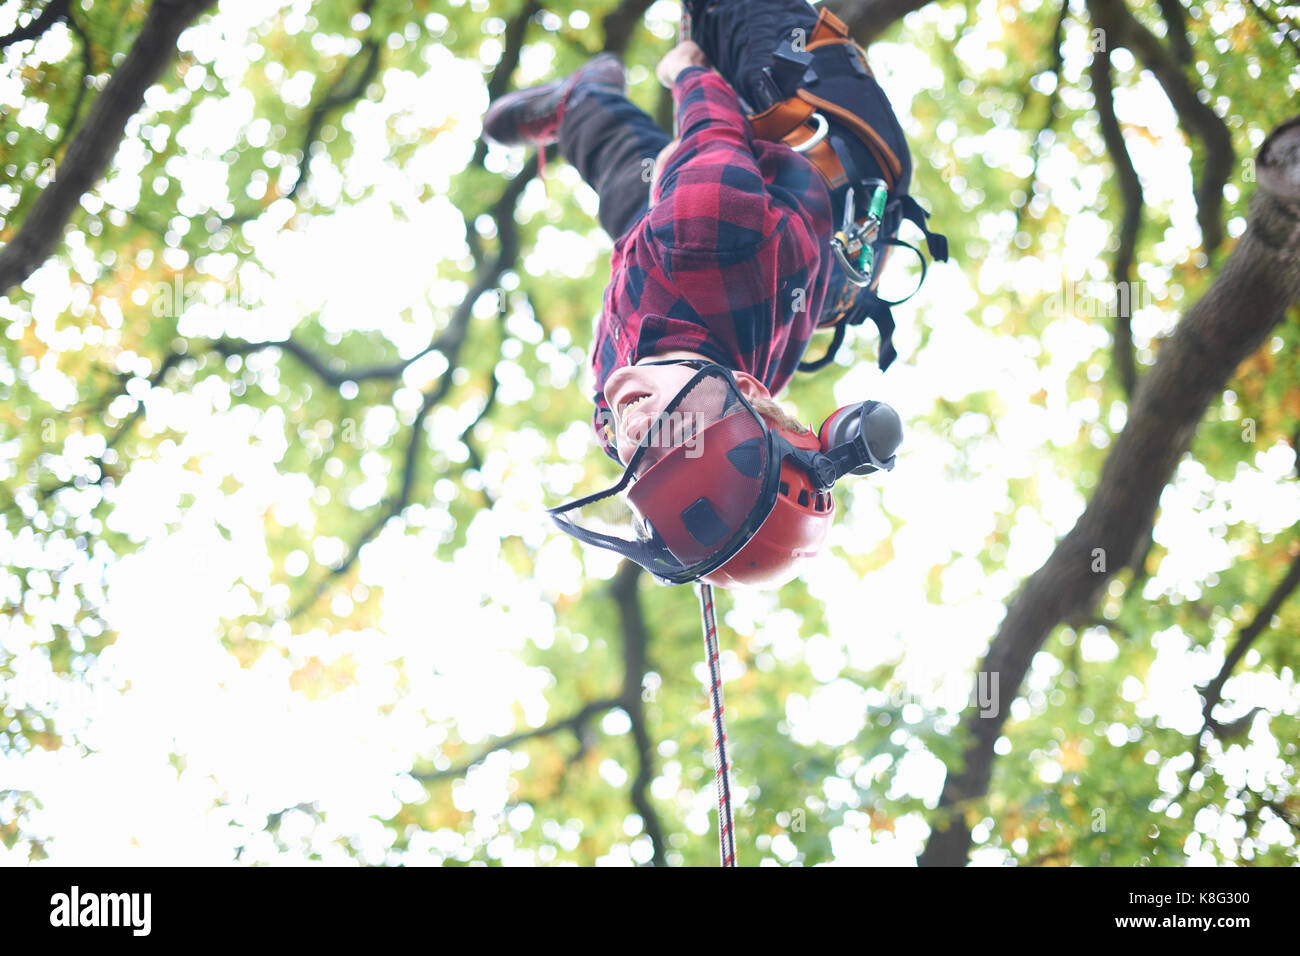 Trainee teenage male tree surgeon hanging upside down from tree branch - Stock Image